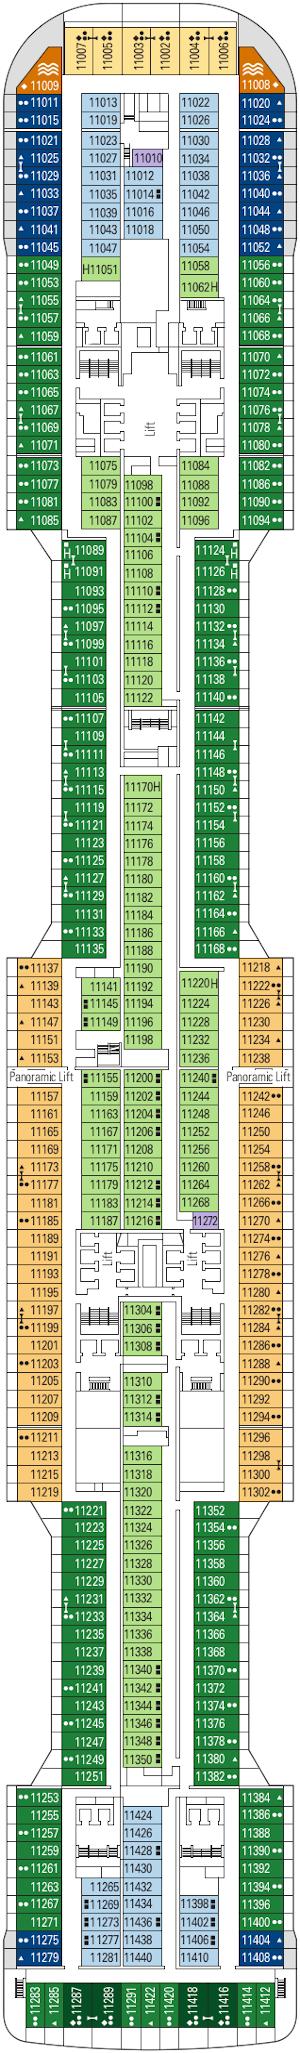 Msc Grandiosa Deck Eleven Deck Plan